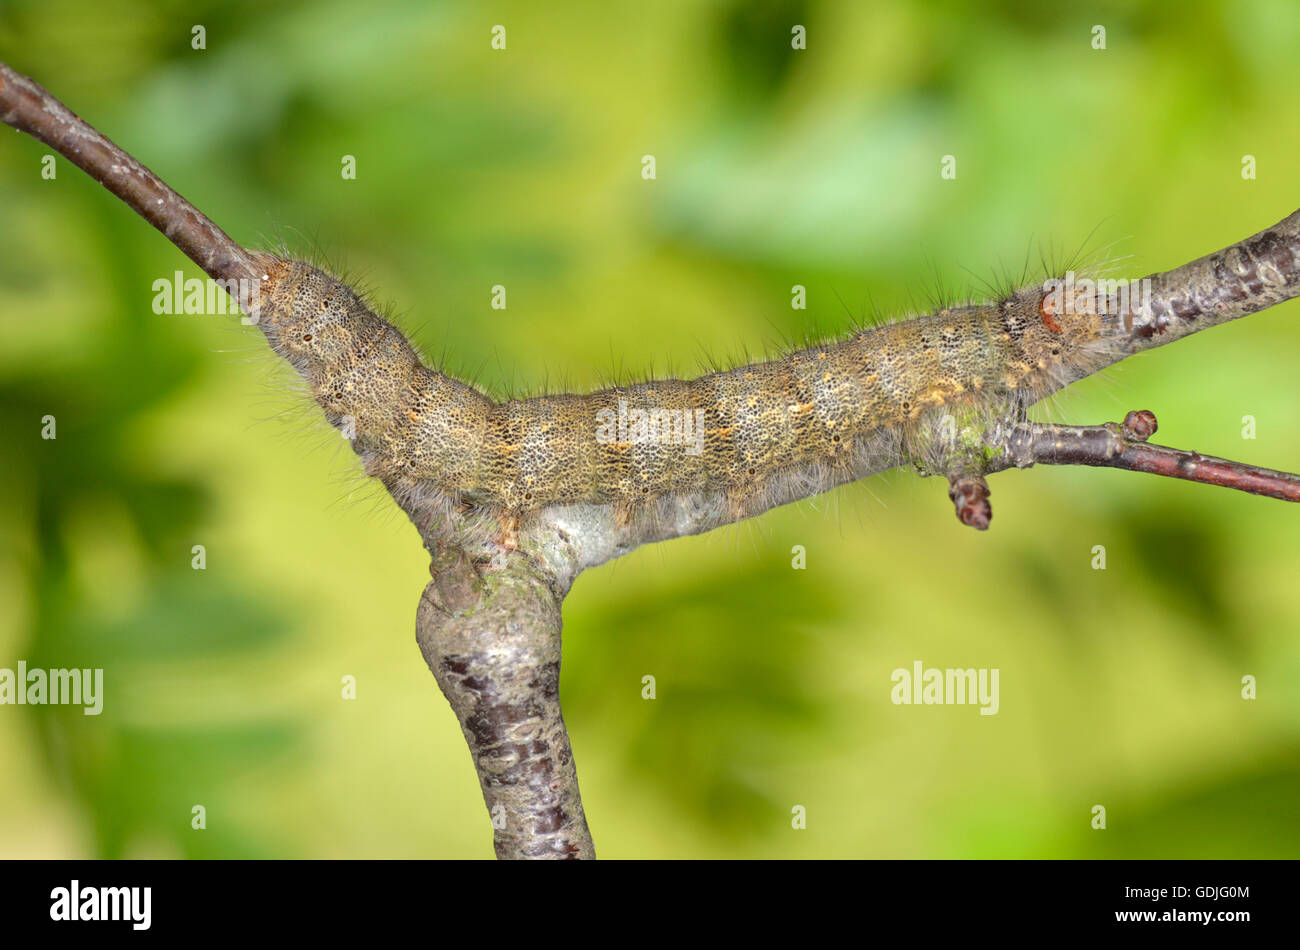 December Moth - Poecilocampa populi - larva. - Stock Image